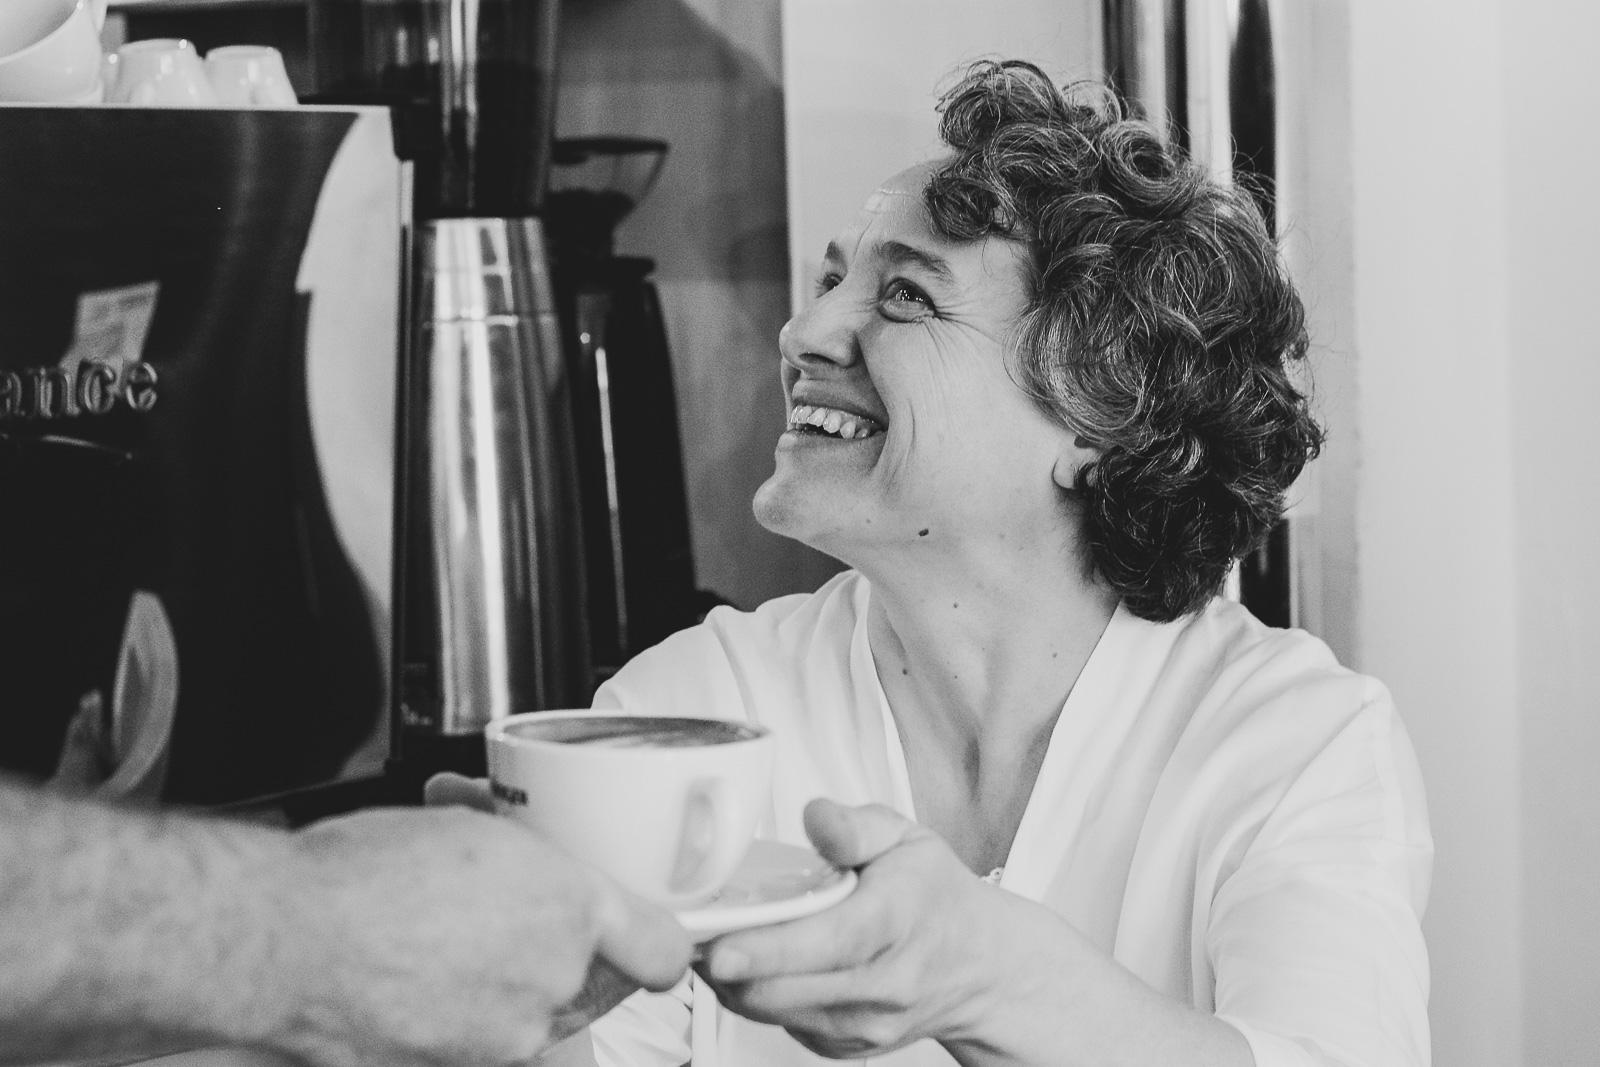 Frau freut sich über duftenden Kaffee